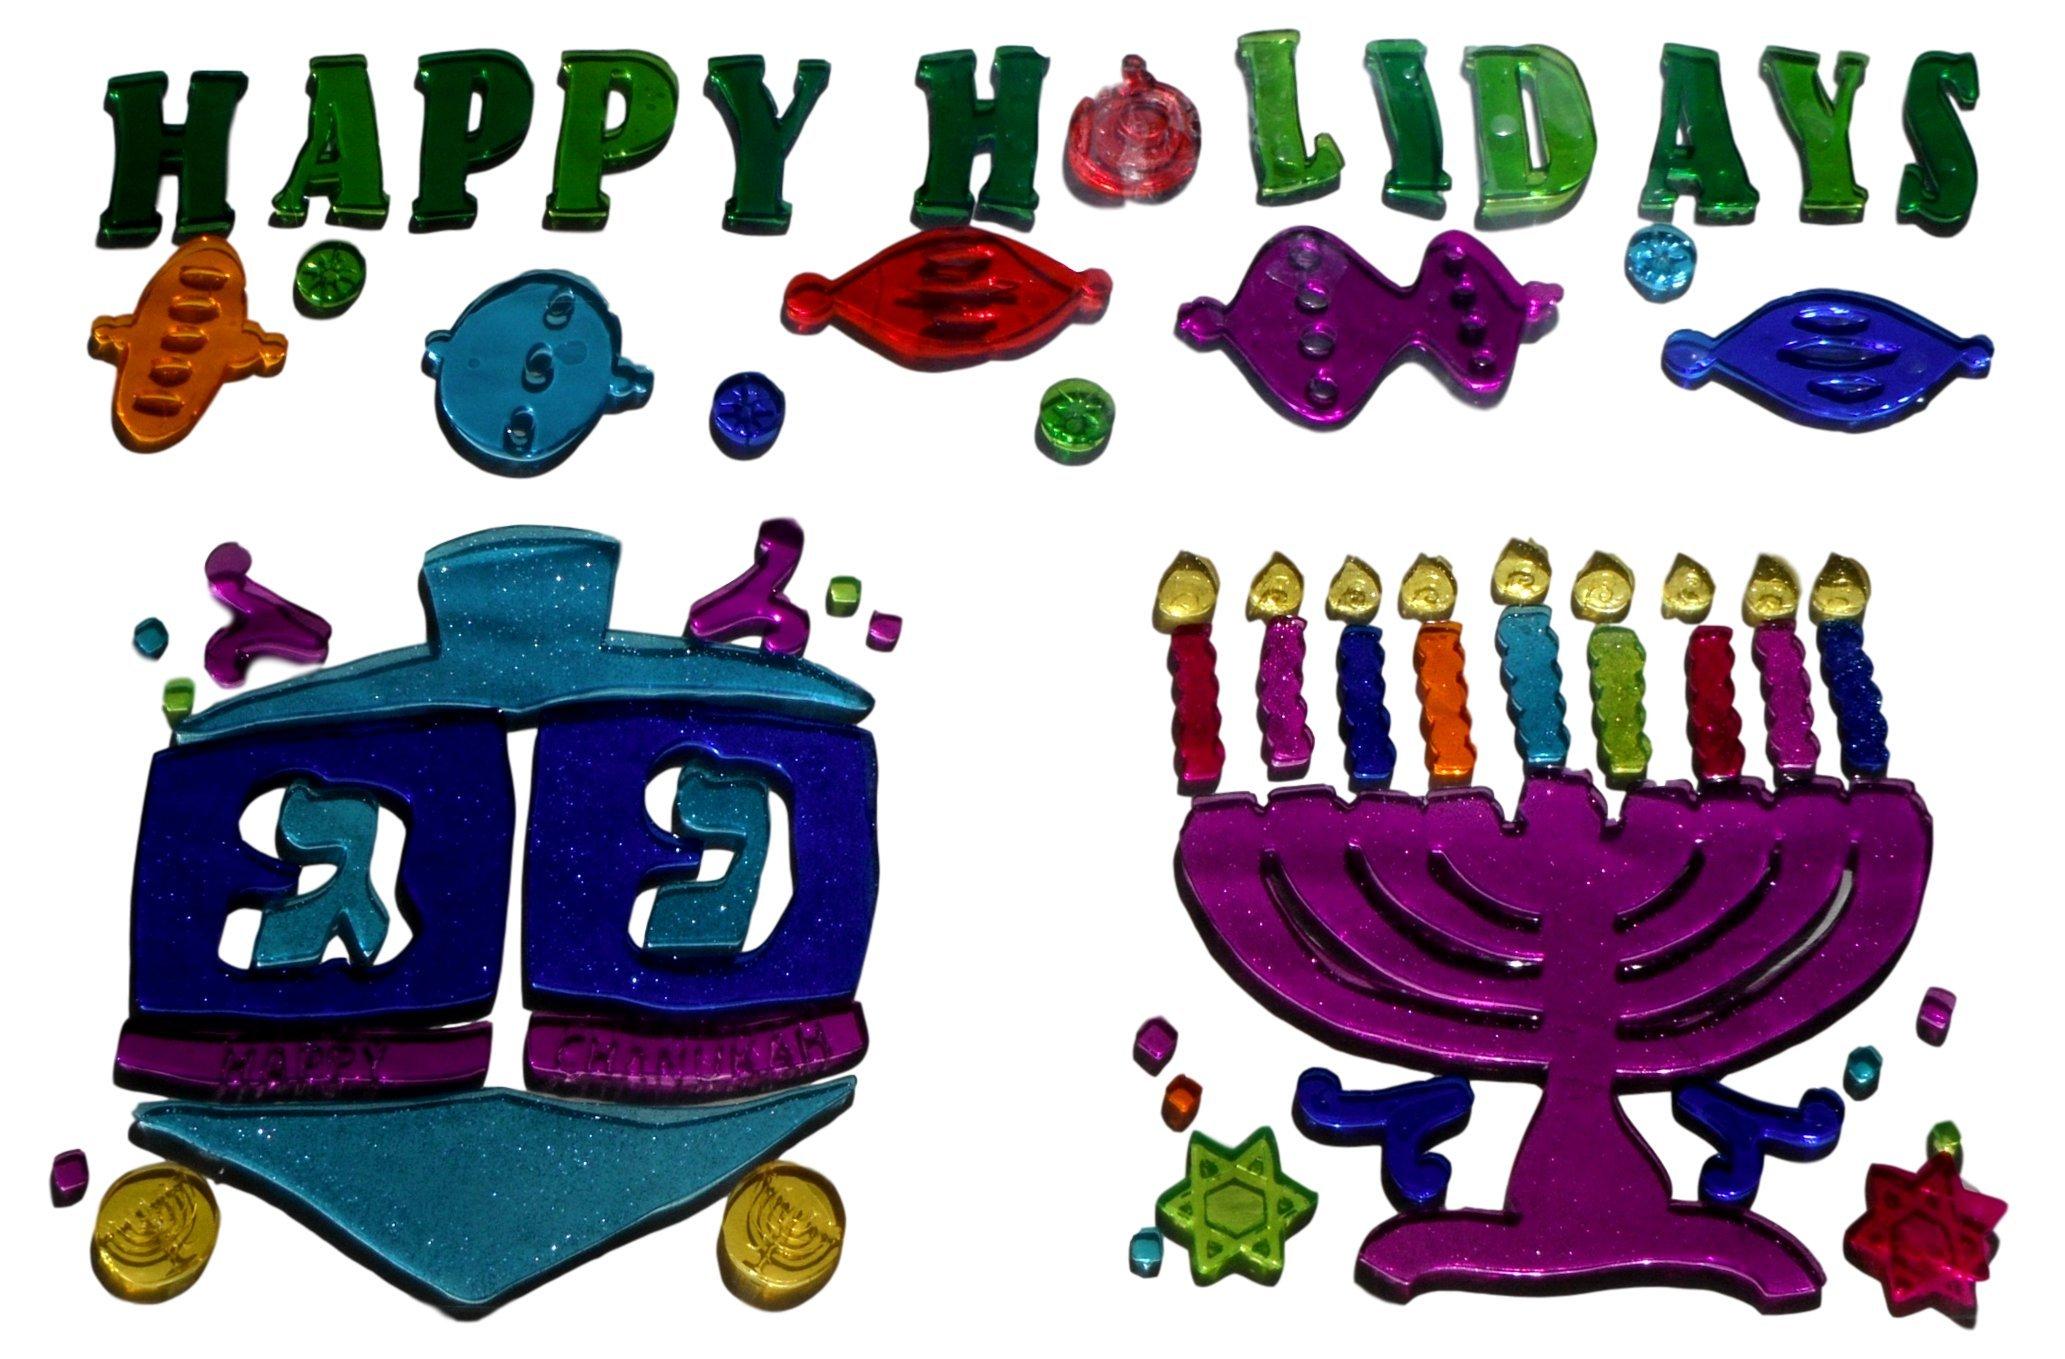 Holiday Diversity Window Gel Clings - Hanukkah and Christmas Decorations (Happy Holidays with Ornaments - Dreidel, Menorah)